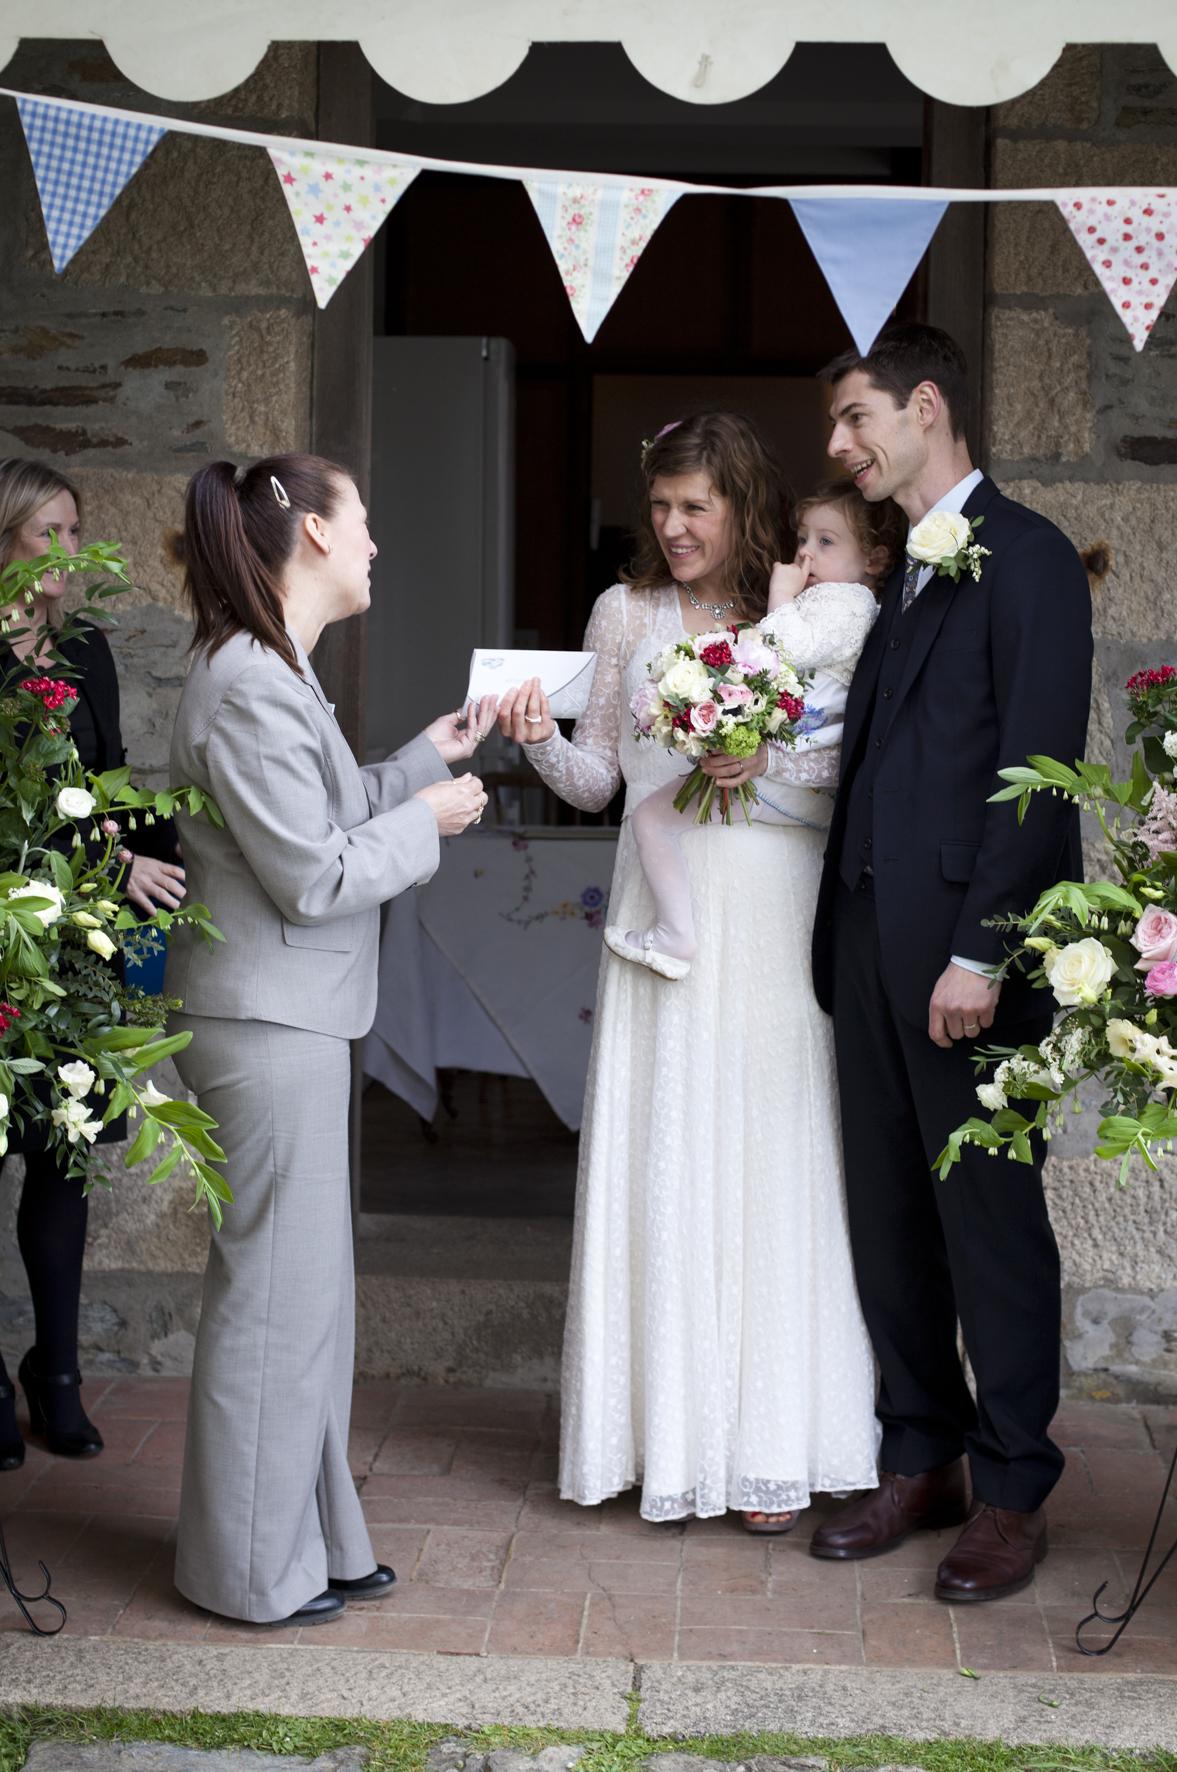 Wedding example_M&P__MG_3527_Claudia Leisinger.jpg